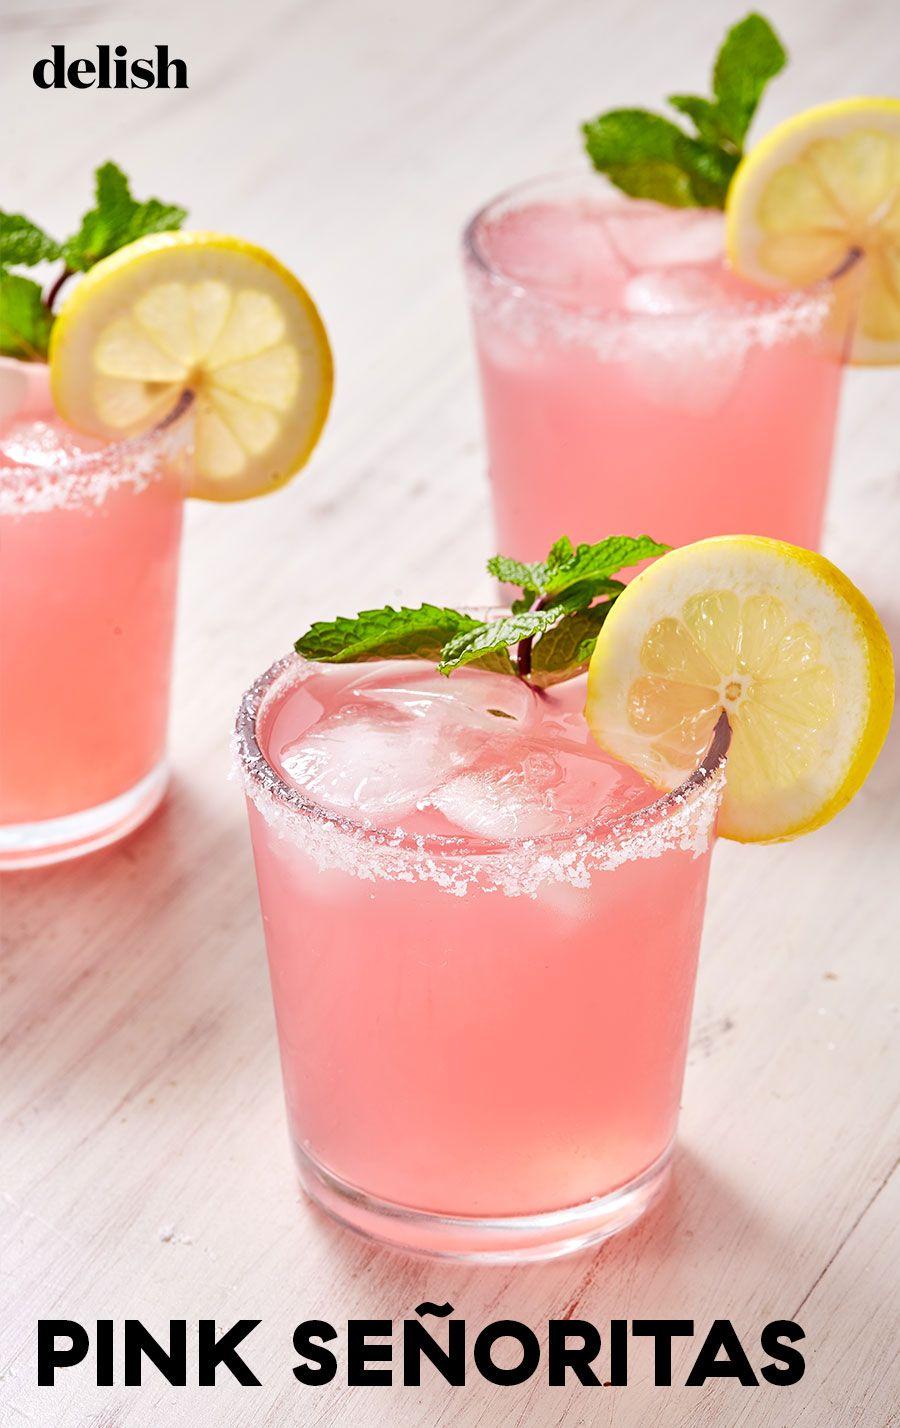 Pink Señoritas